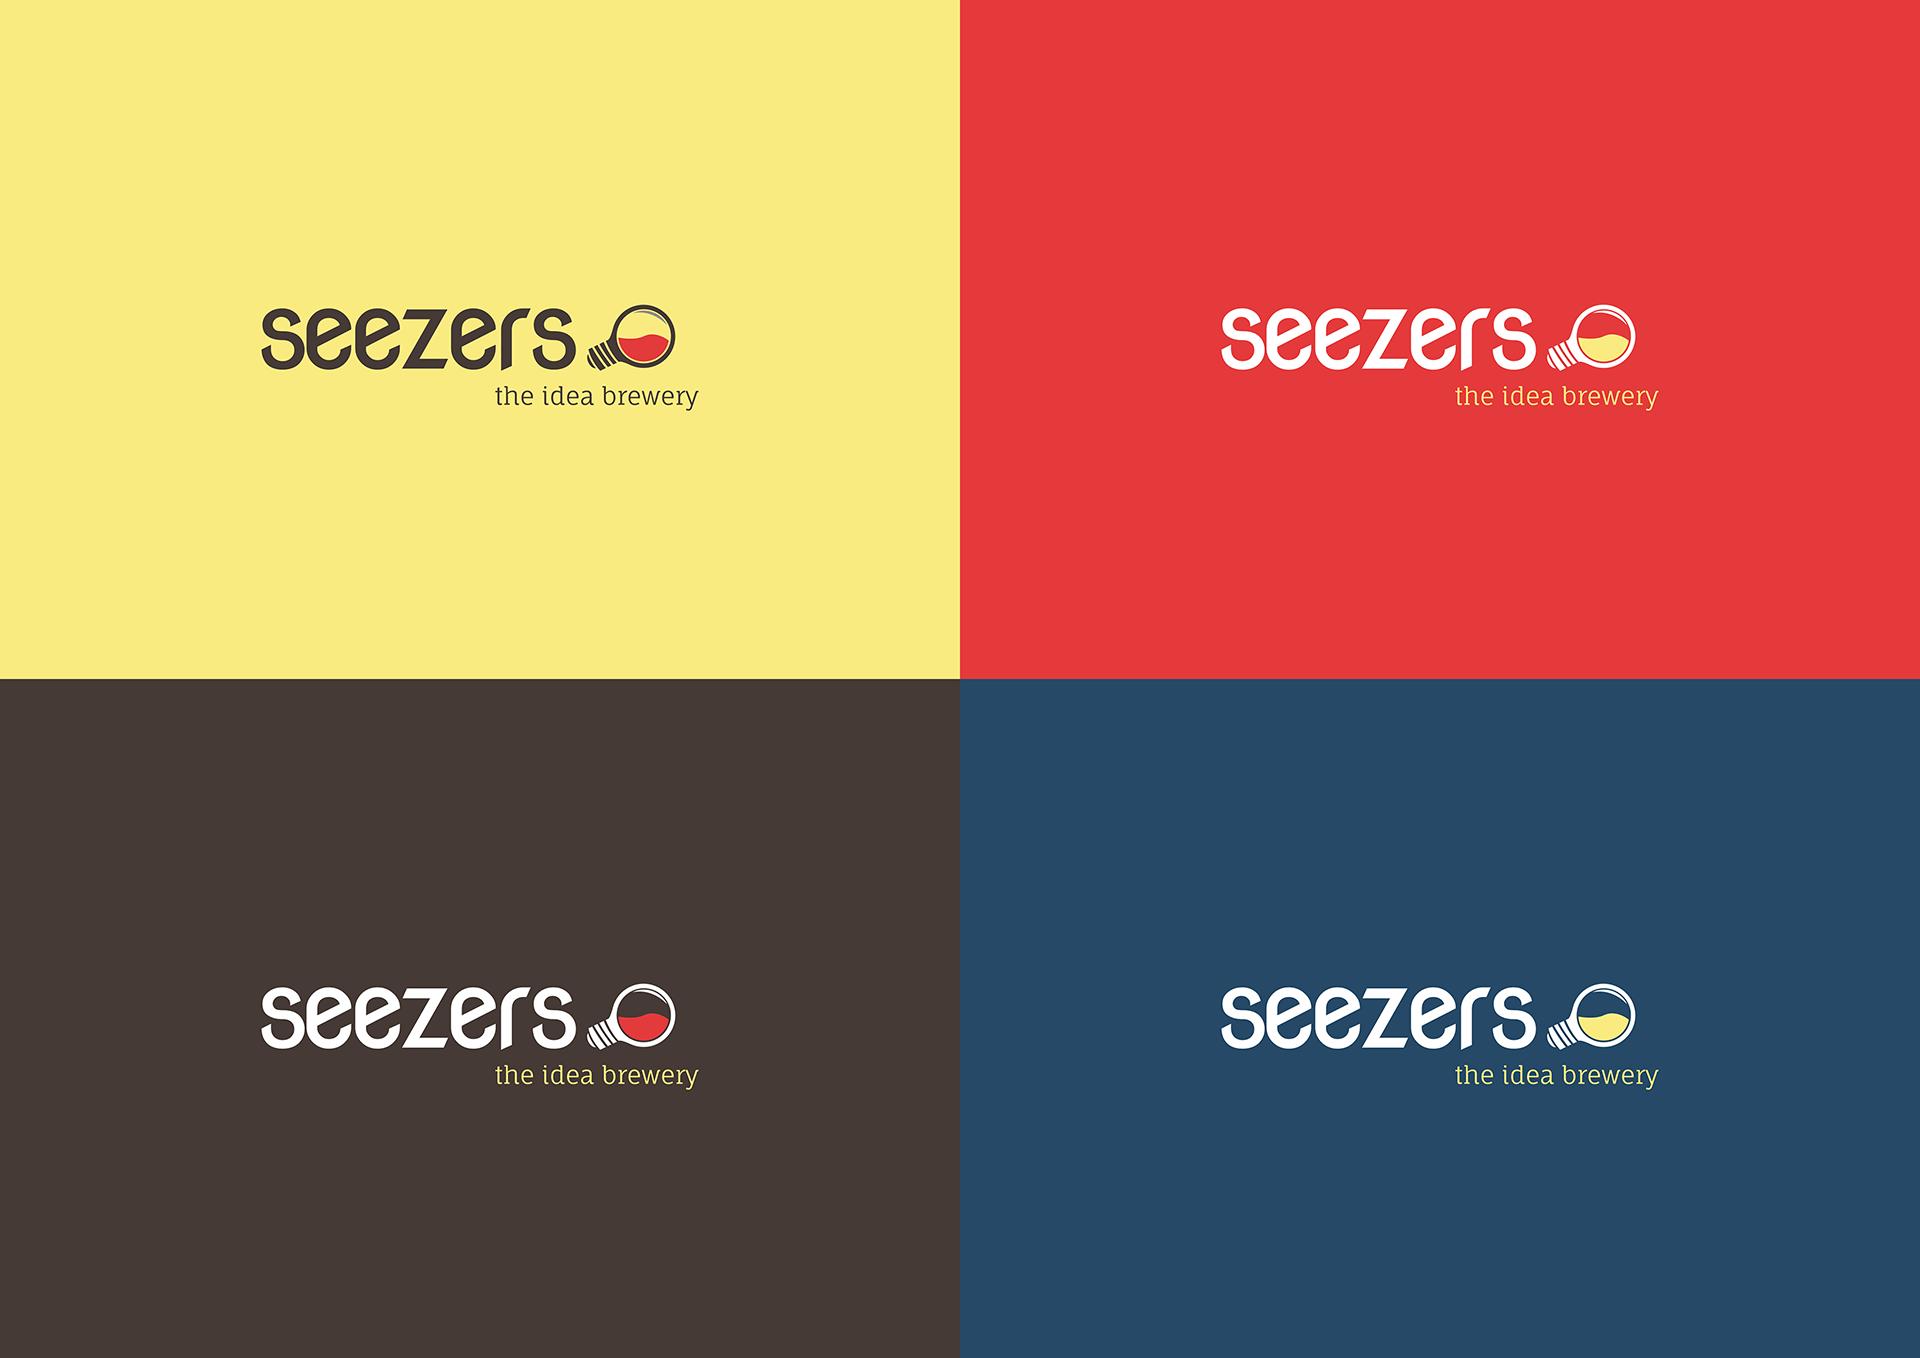 All four logo variations